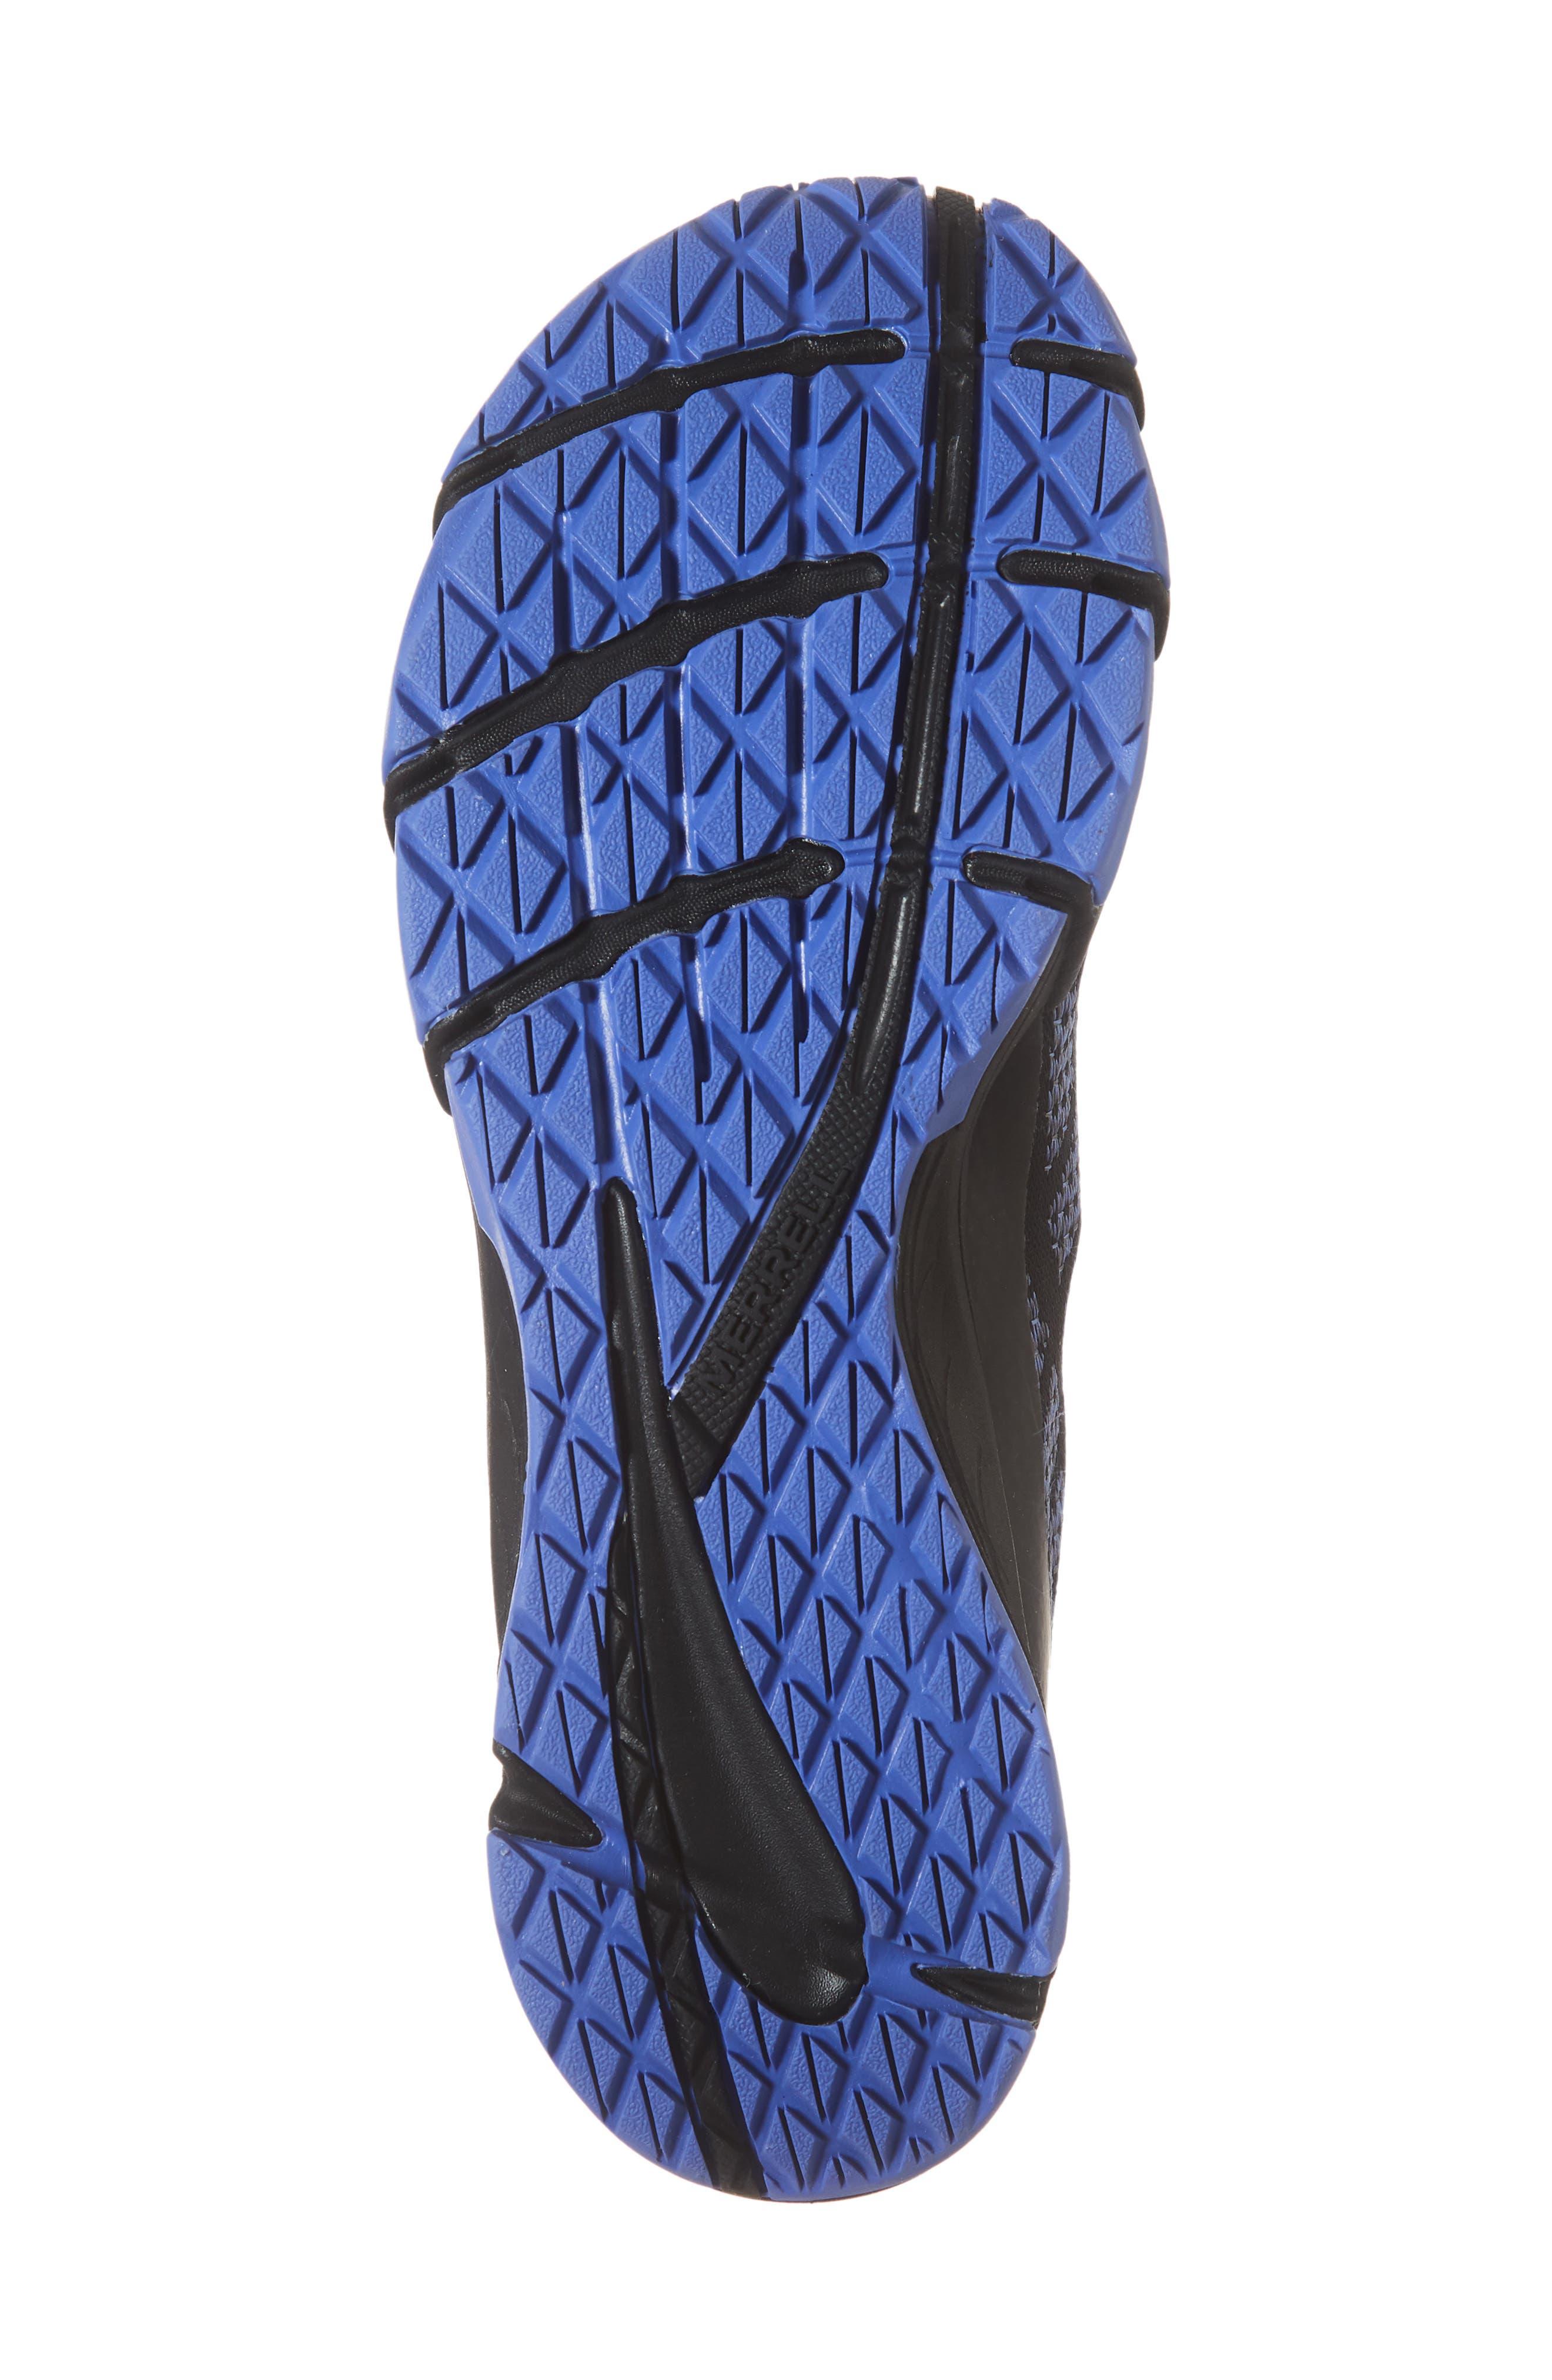 MERRELL, Bare Access Flex Shield Lace-Up Sneaker, Alternate thumbnail 6, color, 001